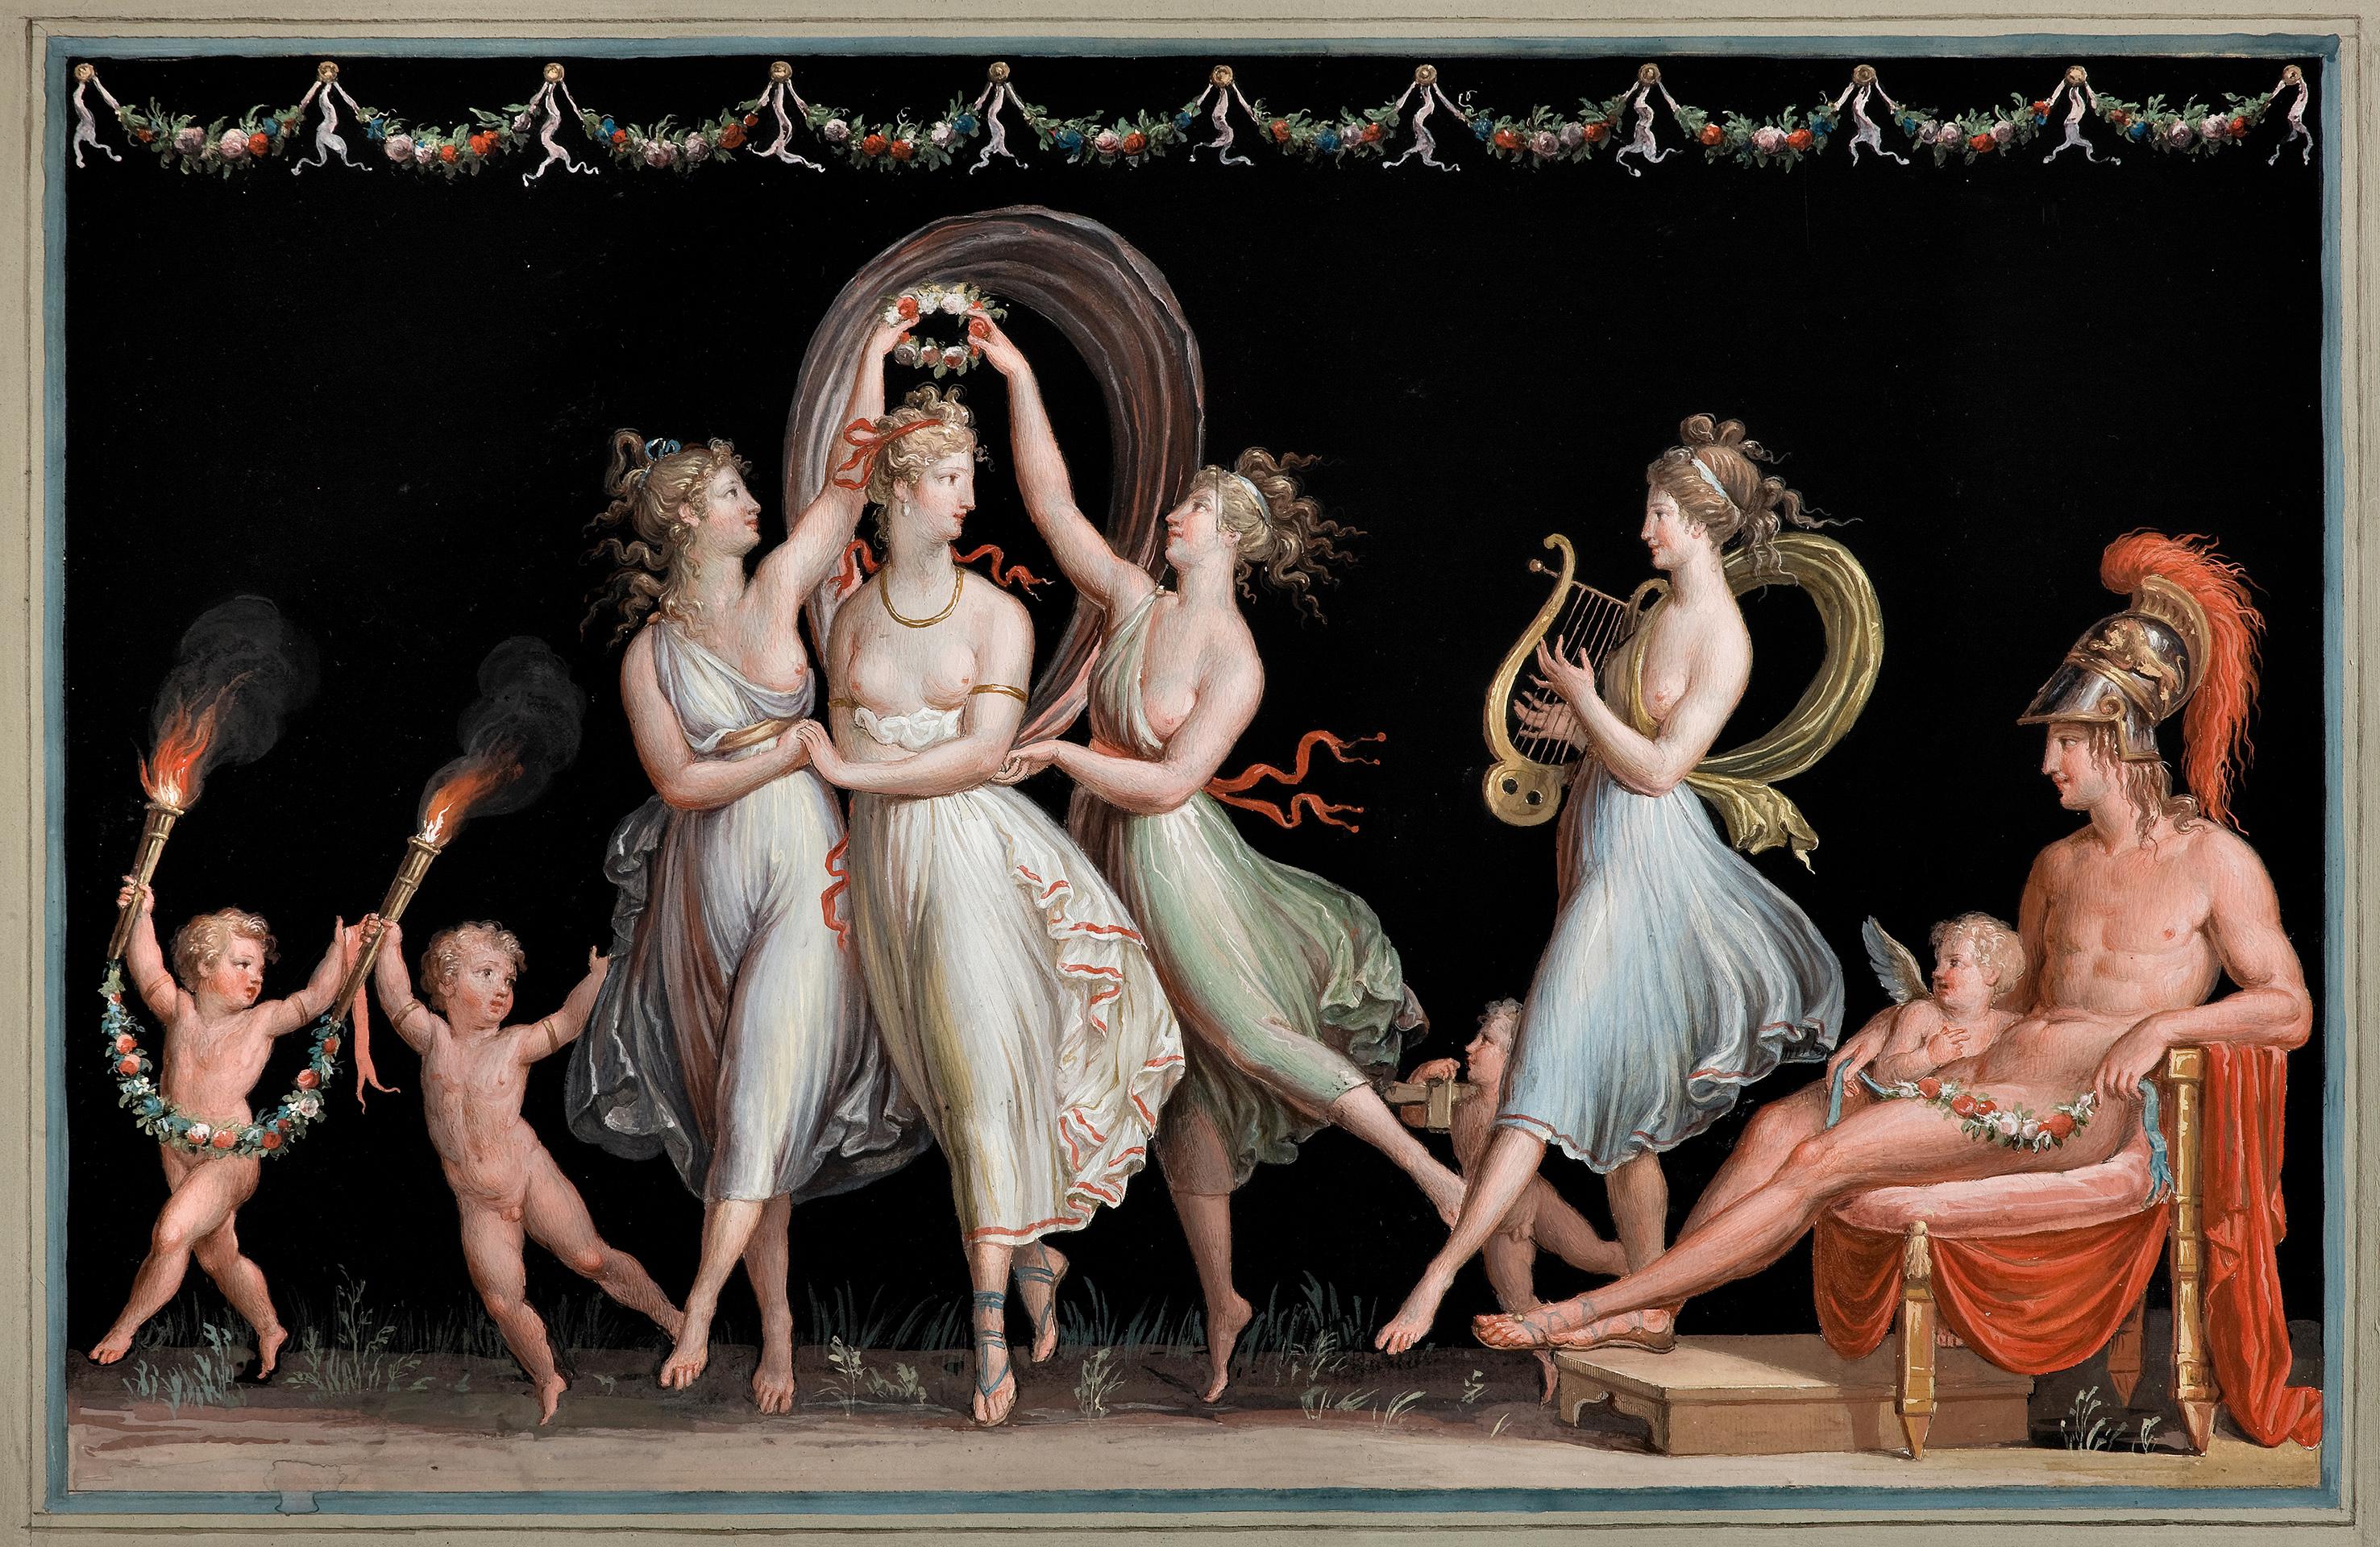 Antonio CanovaDie Grazien und Venus tanzen vor Mars, 1799Tempera auf Papier© Museo e Gipsoteca Antonio Canova, Possagno (Treviso)